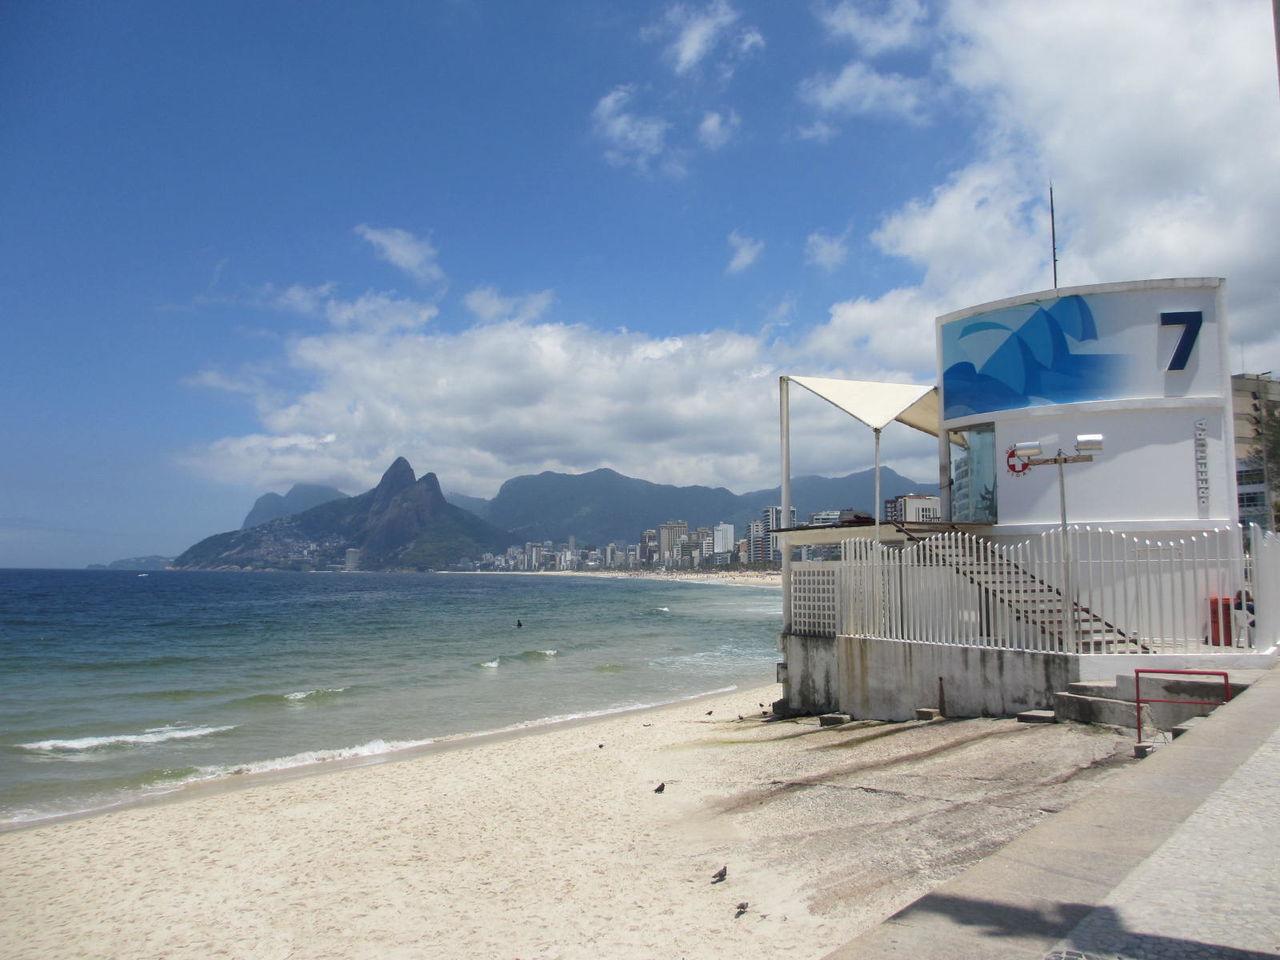 Beautiful stock photos of rio de janeiro, sea, beach, water, sky